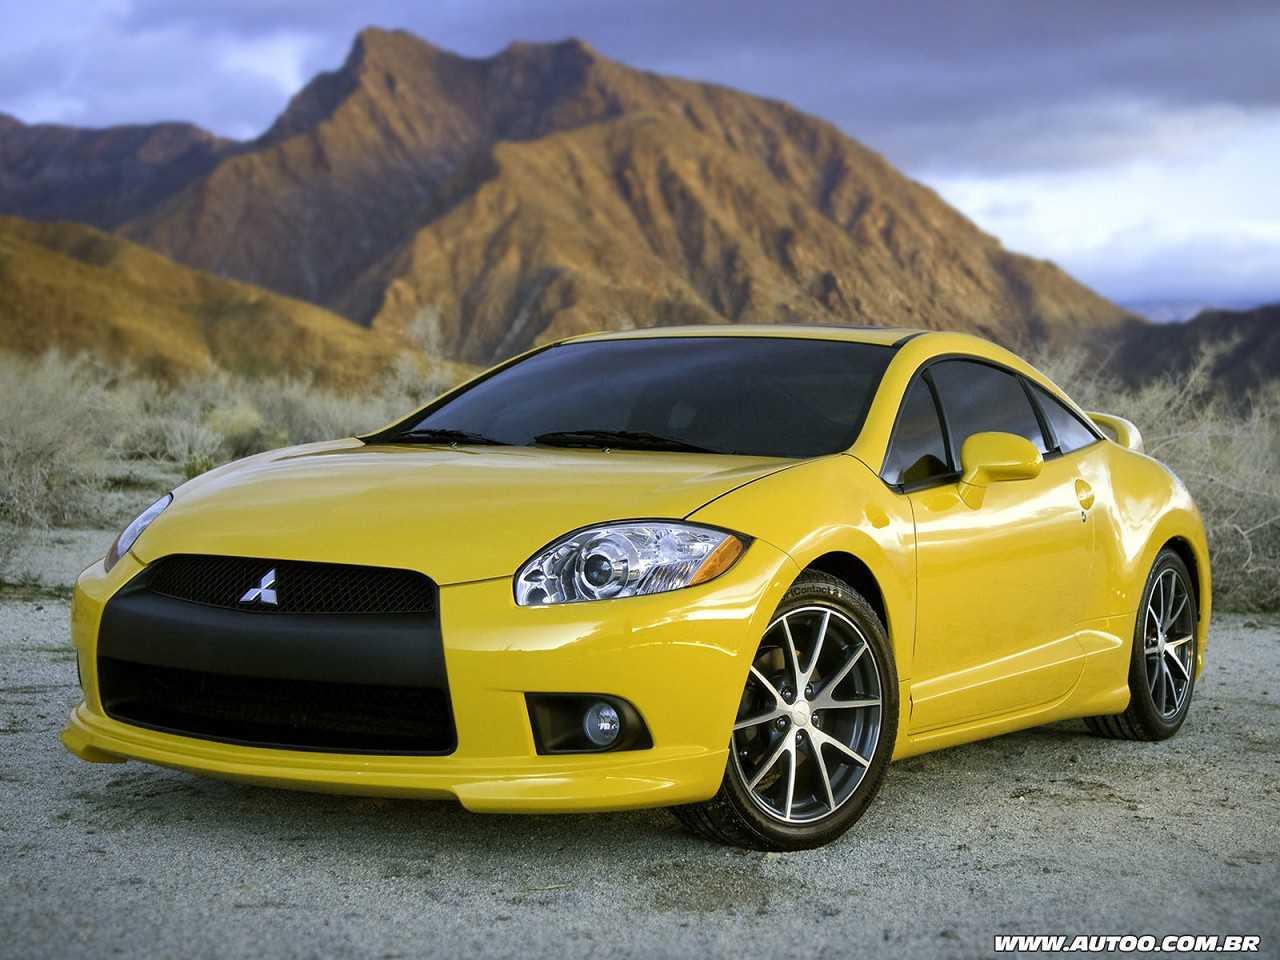 MitsubishiEclipse GT 2009 - ângulo frontal